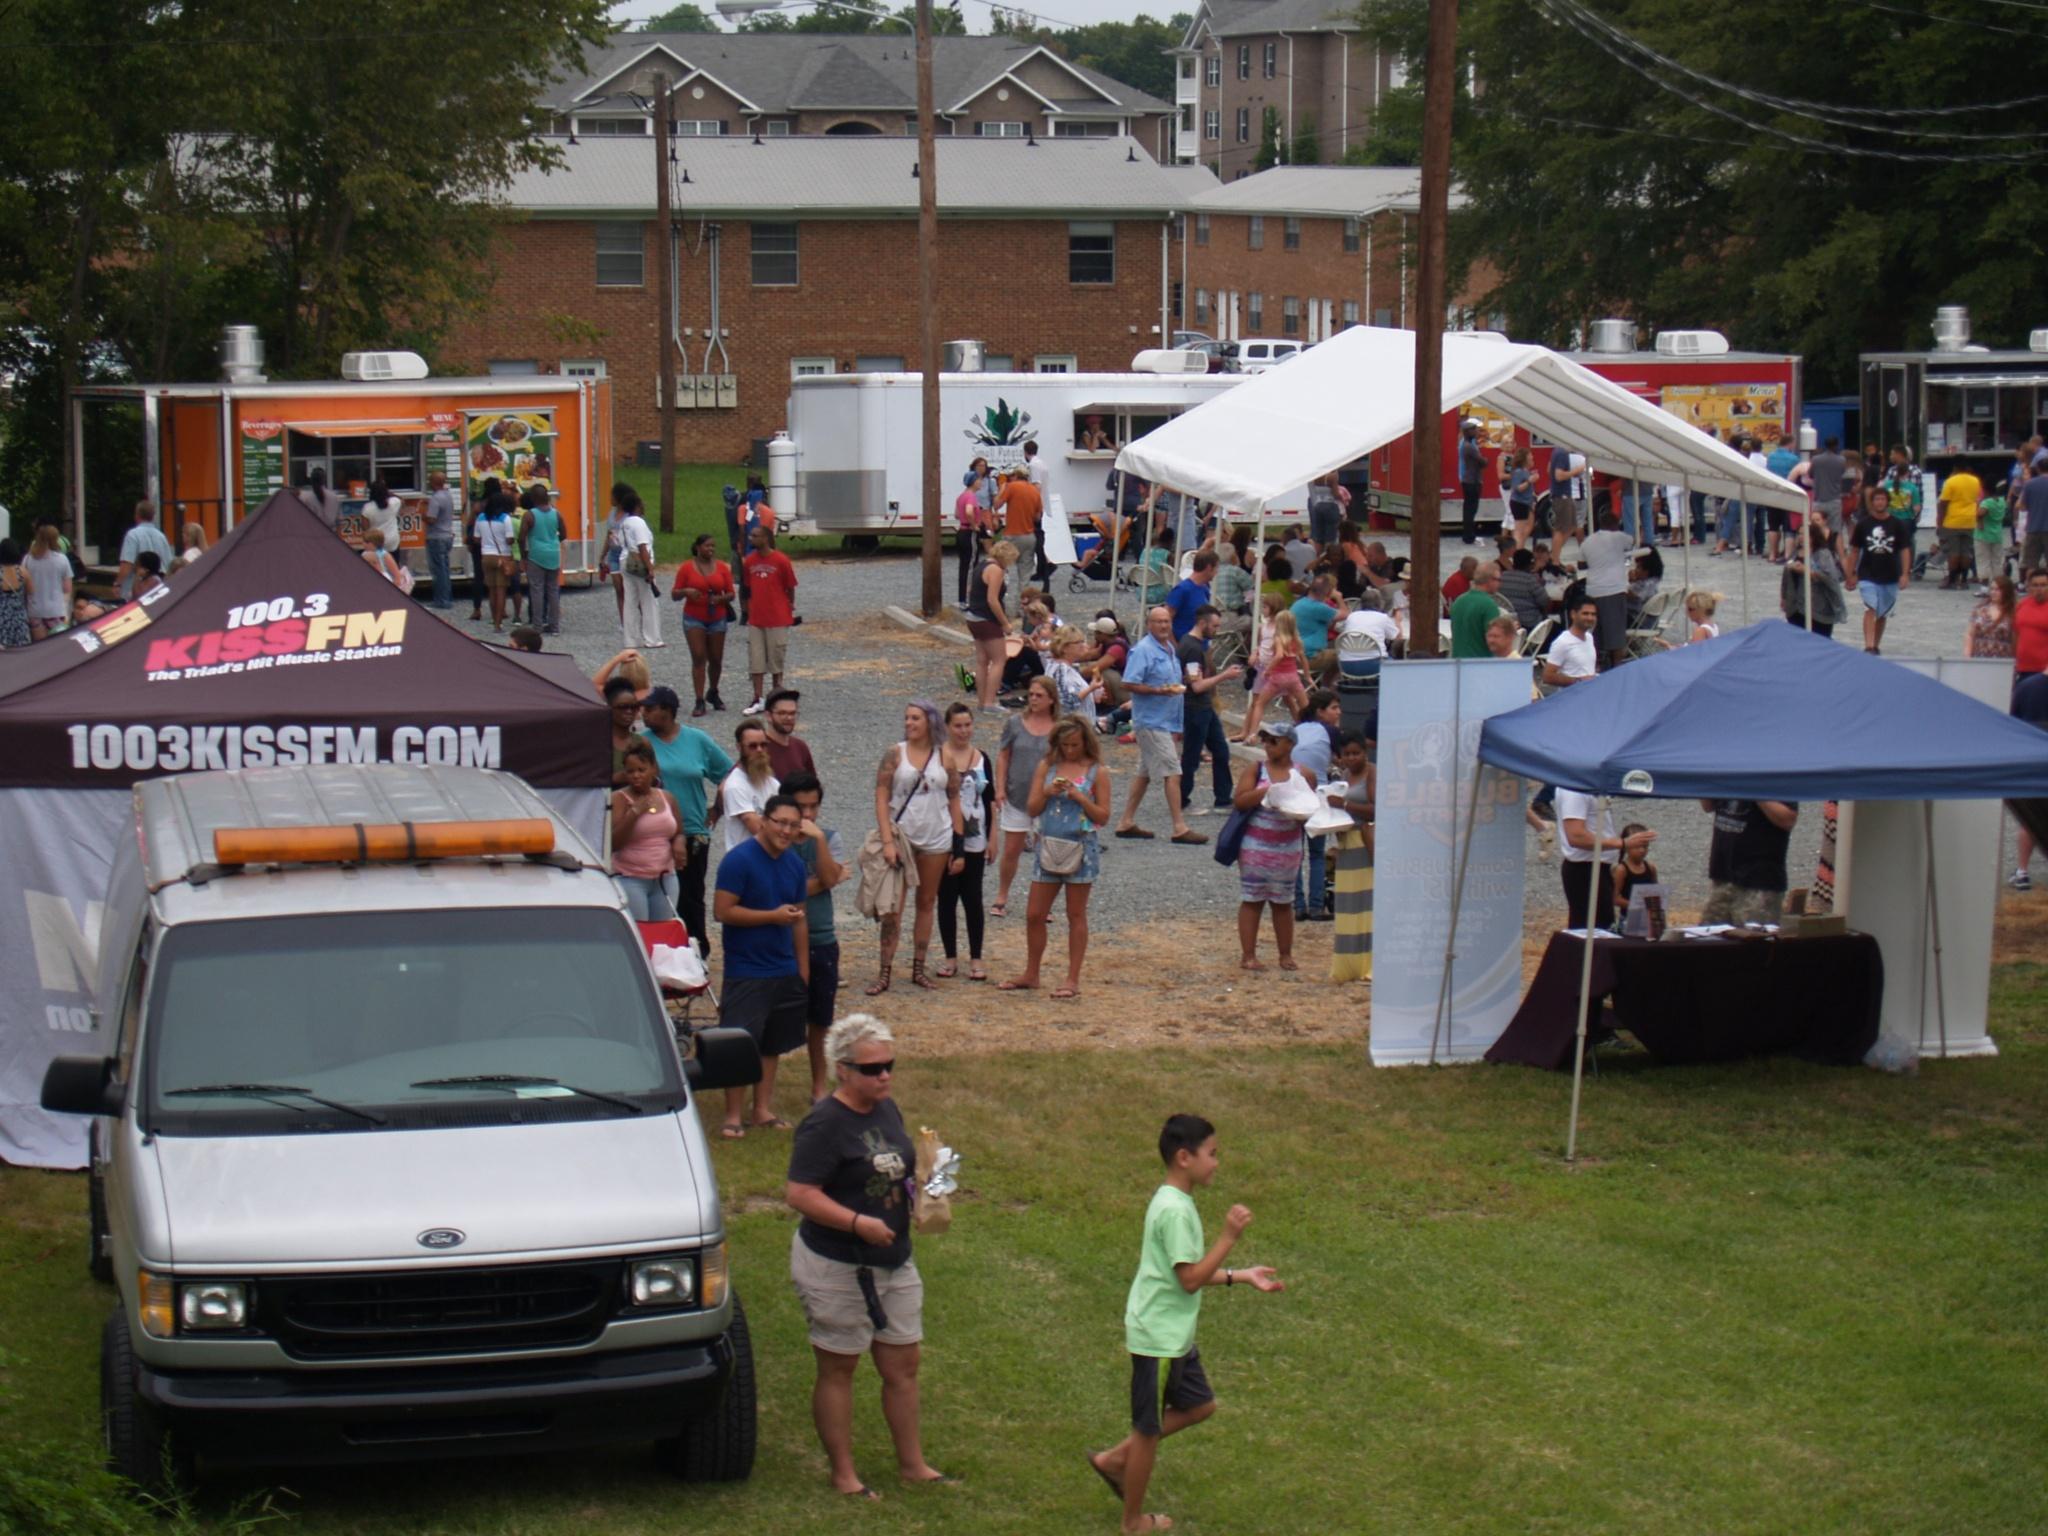 2015 Food Truck Festival Greensboro NC by bobby eaken